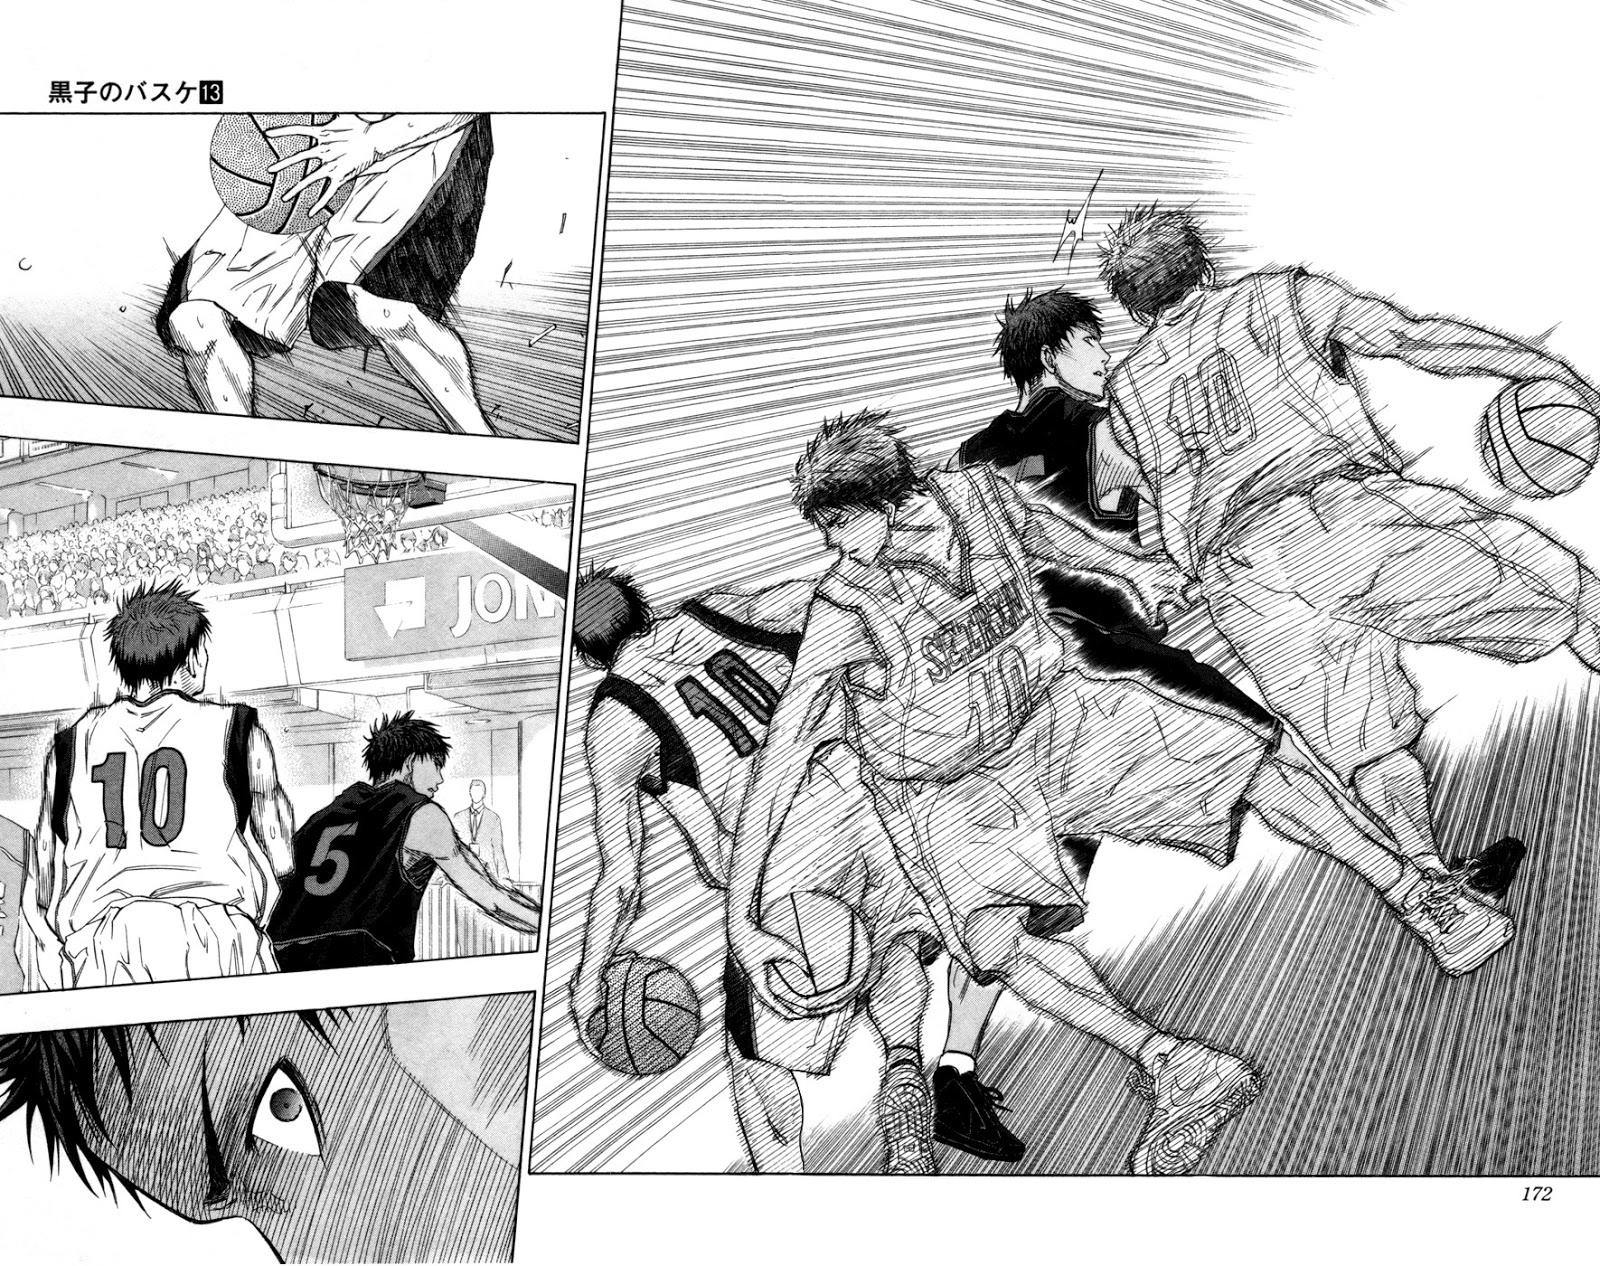 Kuroko no Basket Manga Chapter 117 - Image 2-173